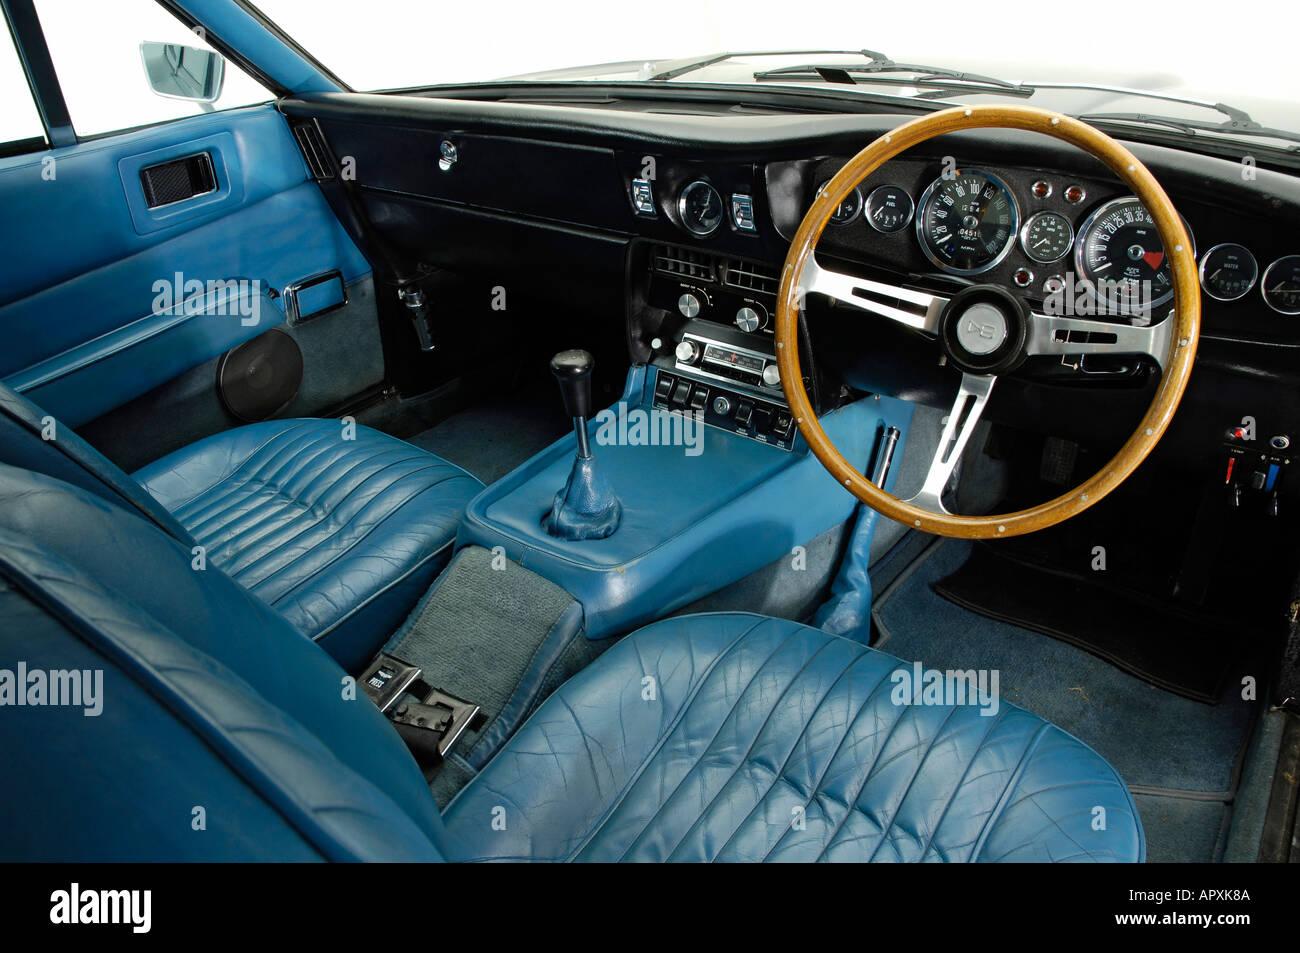 1970 Aston Martin Dbs V8 Stock Photo Alamy